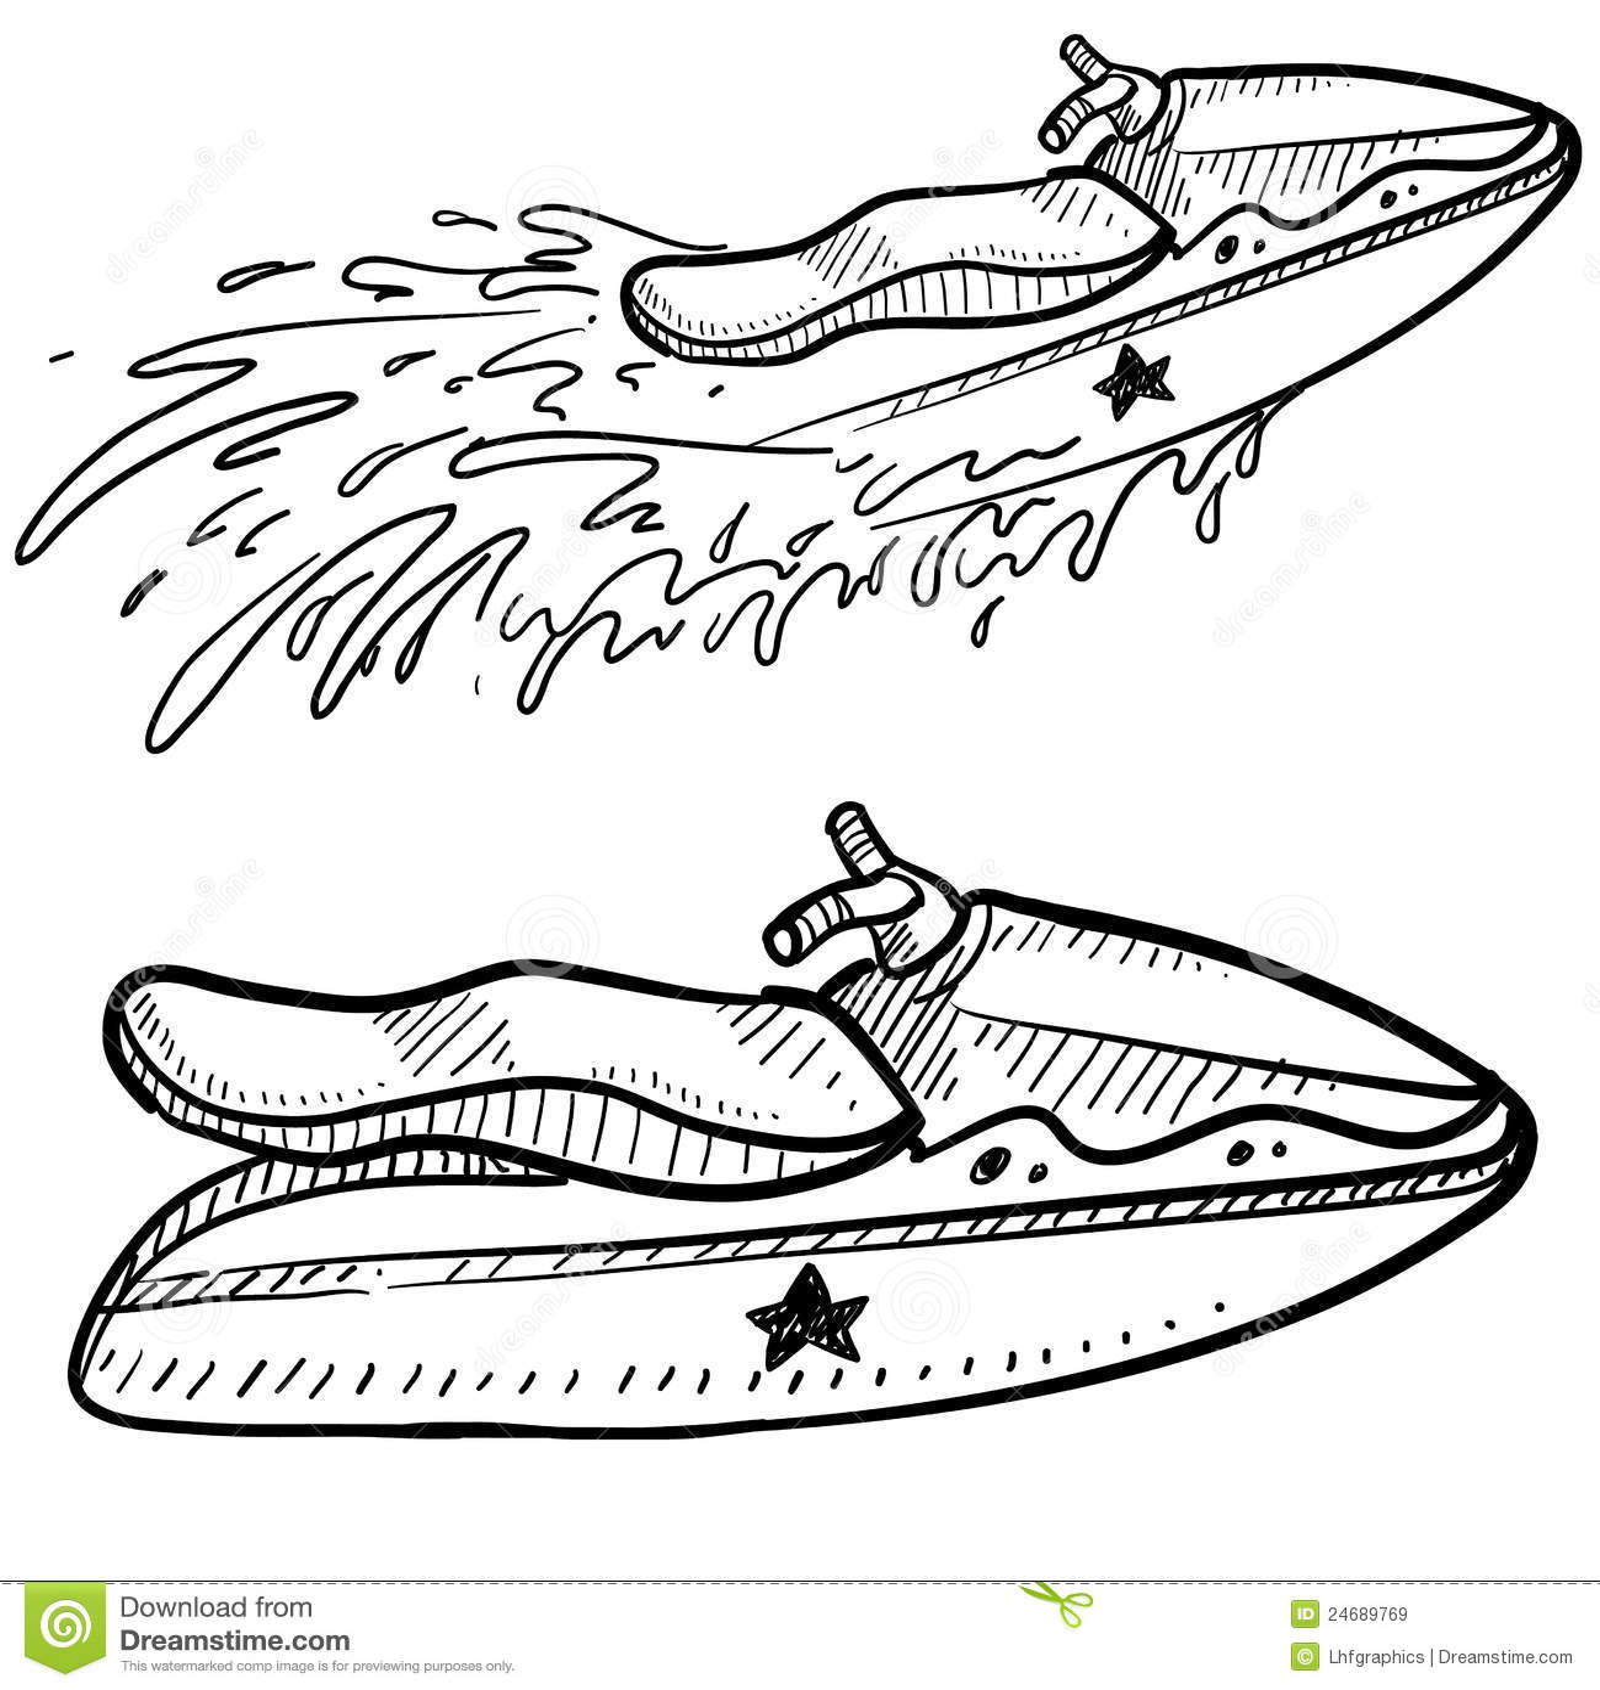 Jet Ski Vector Sketch Royalty Free Stock Images